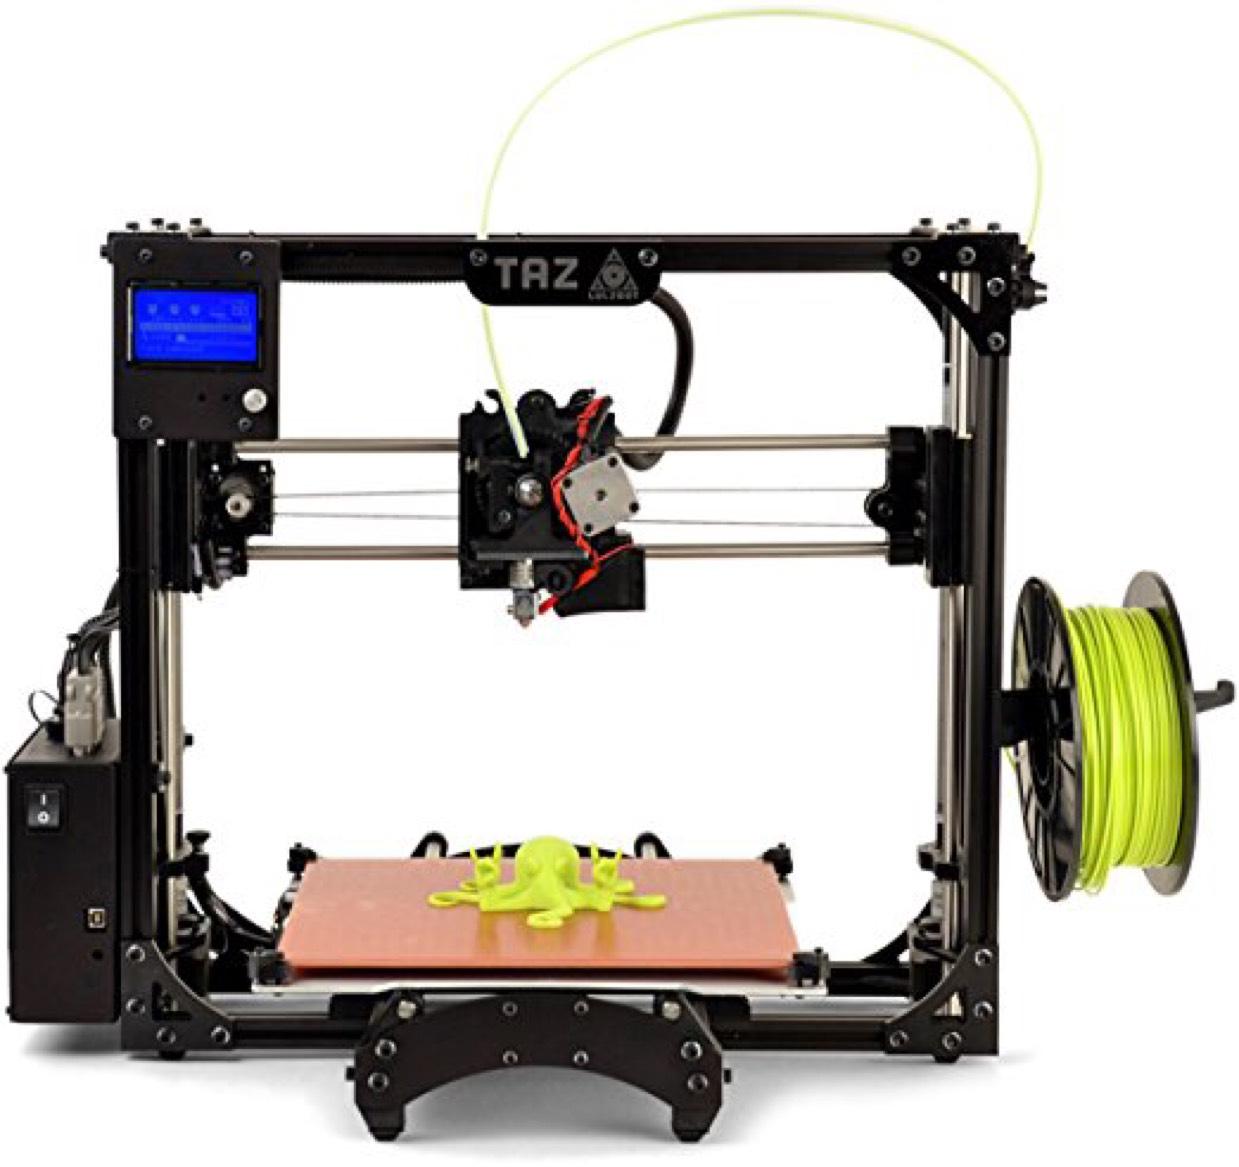 Lulzbot Taz 5 3D Printer Bargain Price - £571.78 @ Amazon